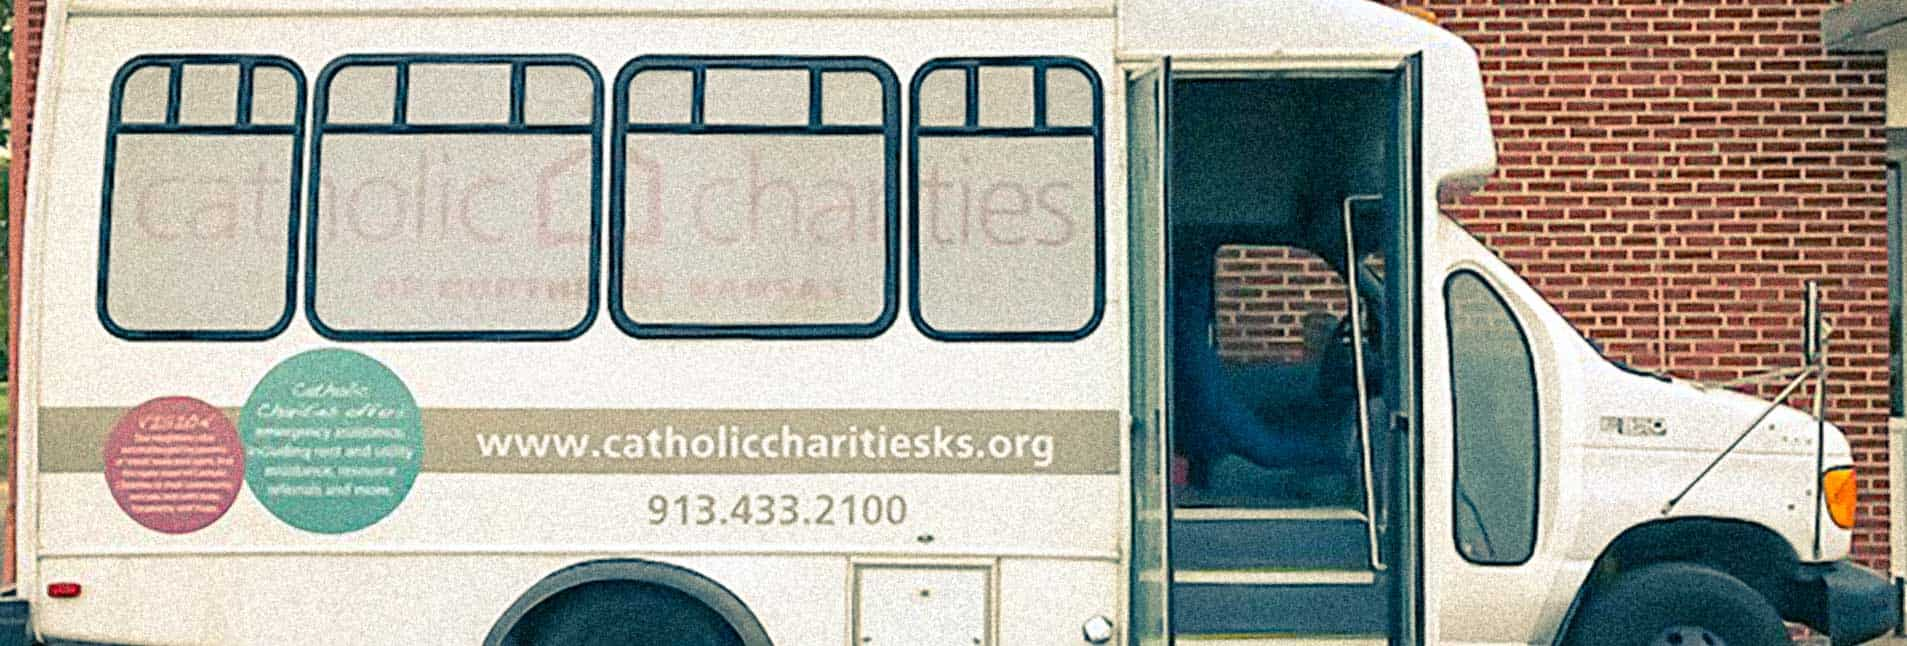 Mobile Resource Bus Catholic Charities of Northeast Kansas